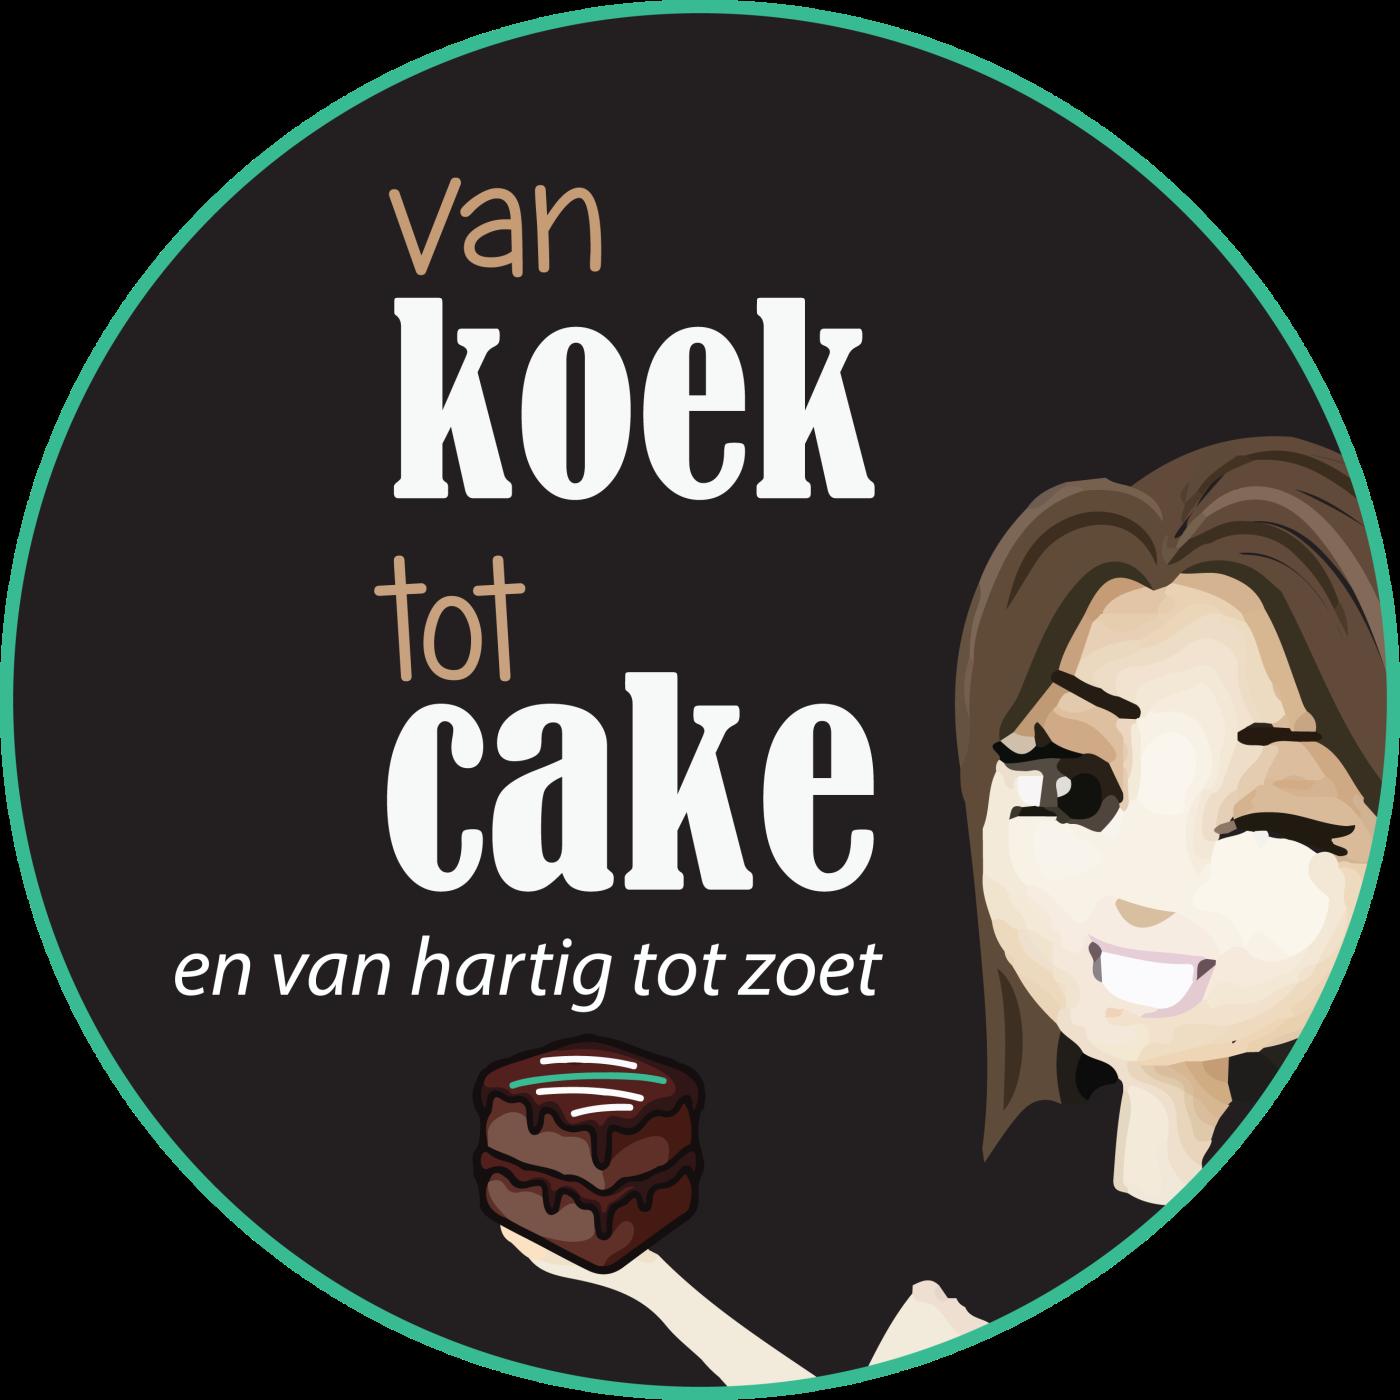 logo van koek tot cake